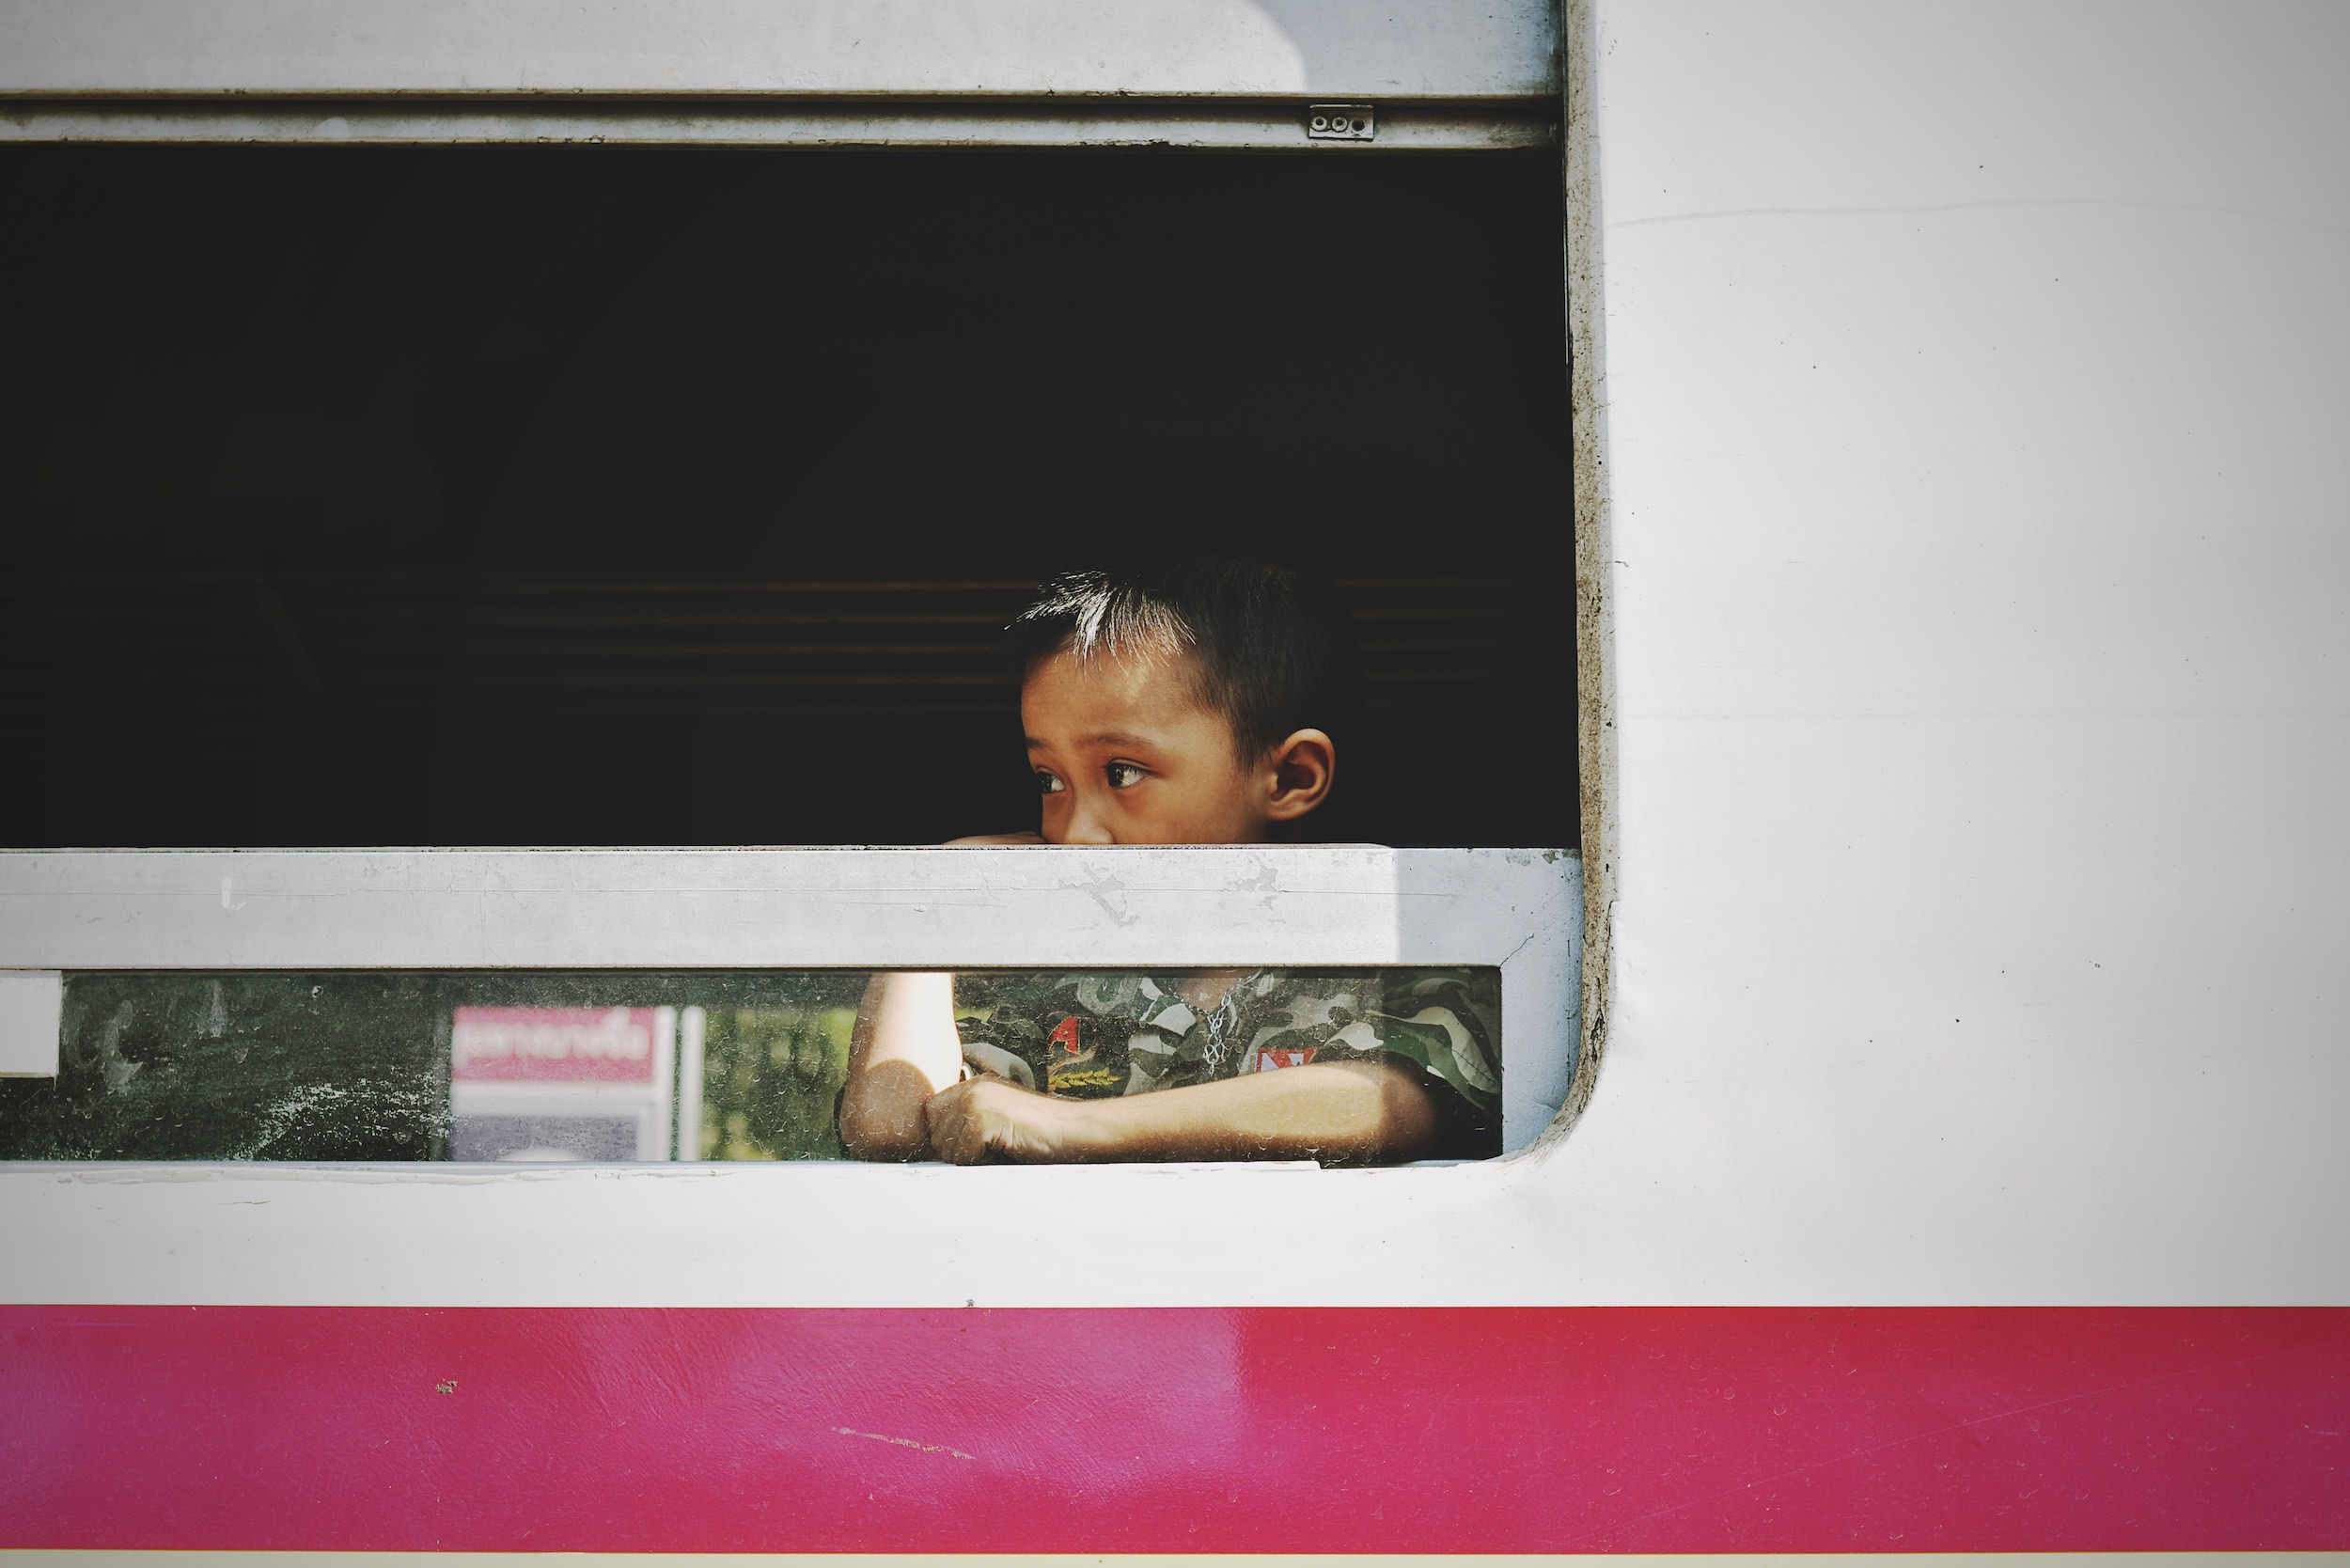 Bangkok_girl_on_train_travel_bangkok.jpg